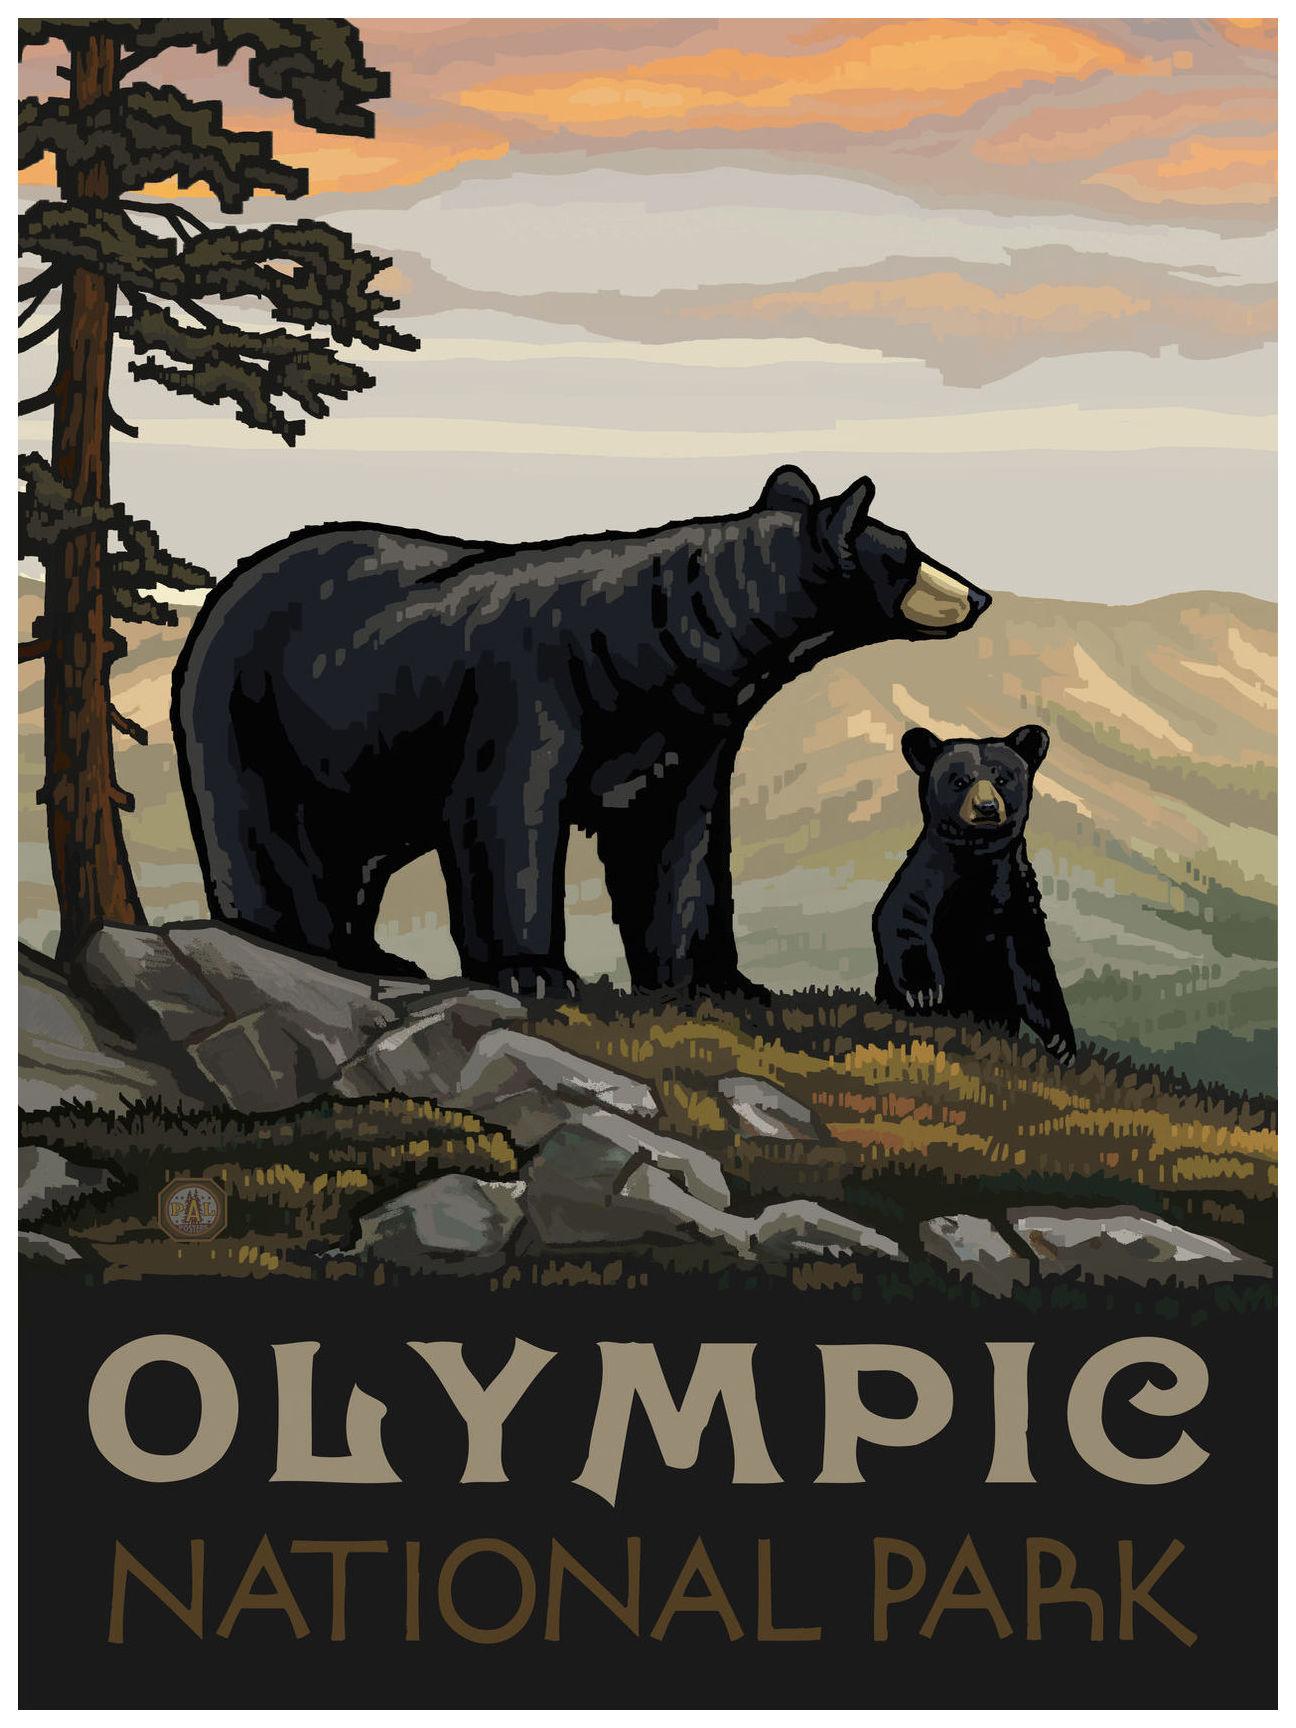 olympic national park washington black bear family giclee art print poster by paul a lanquist 18 x 24 walmart com